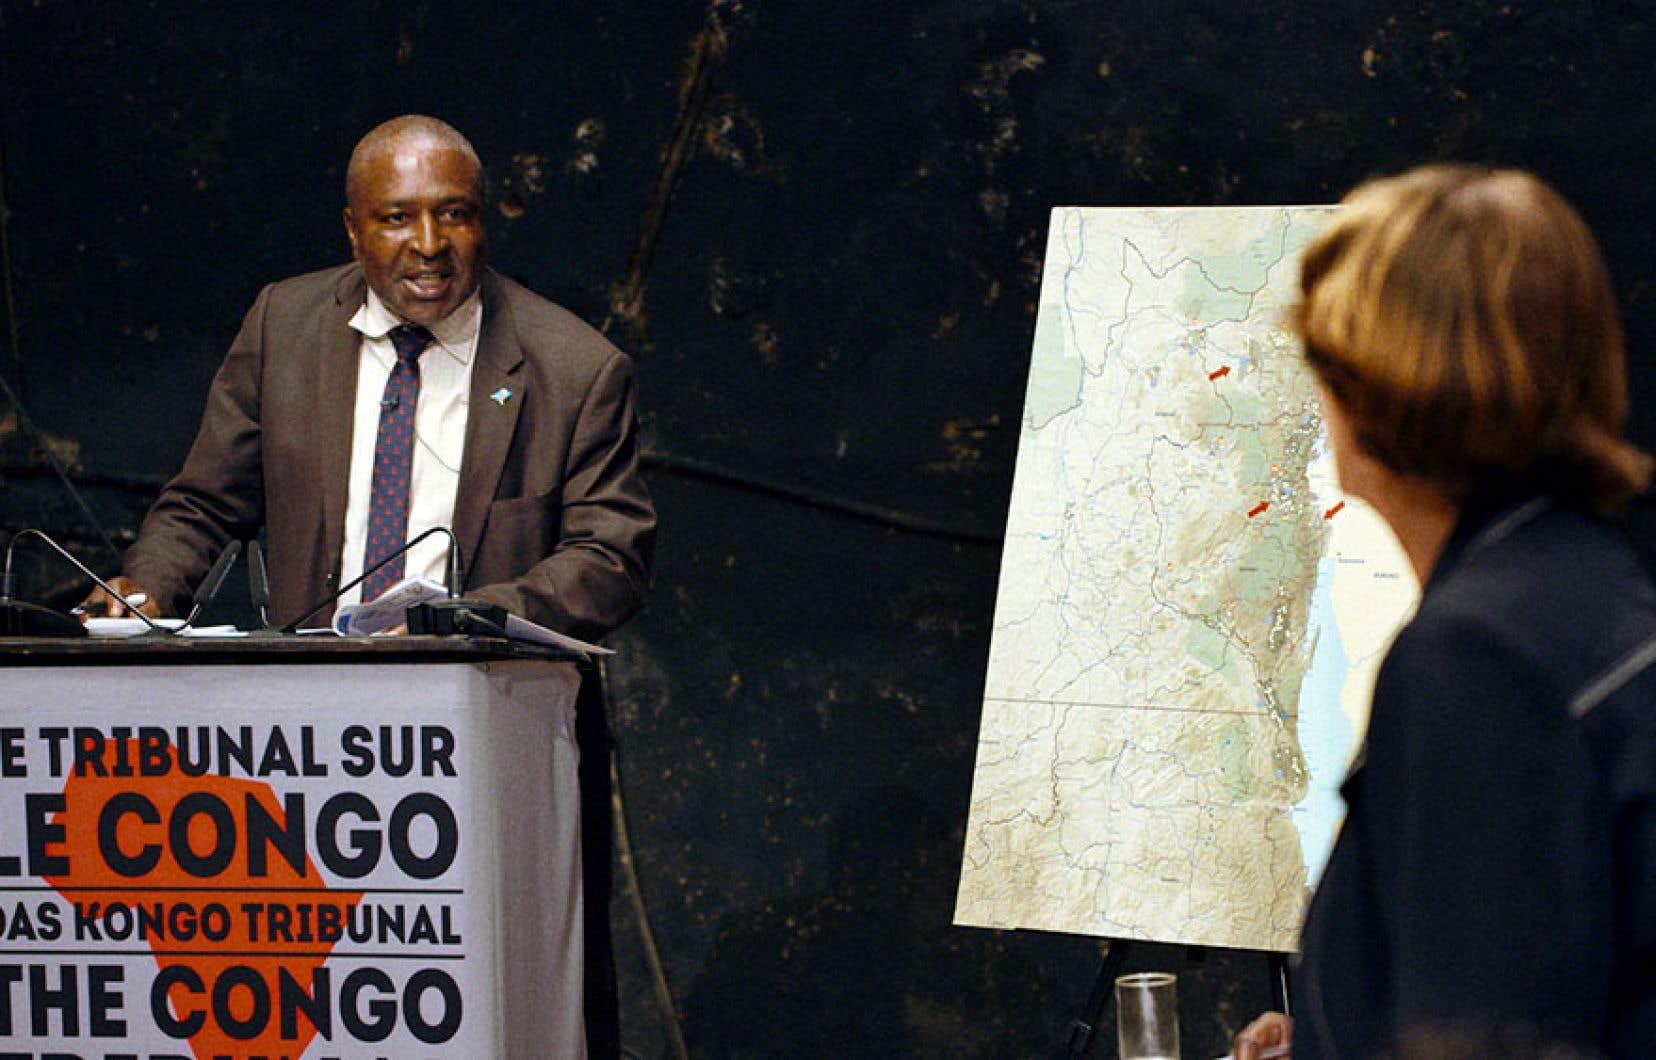 Milo Rau, <em>Tribunal sur le Congo</em>, film documentaire, image fixe, 2017